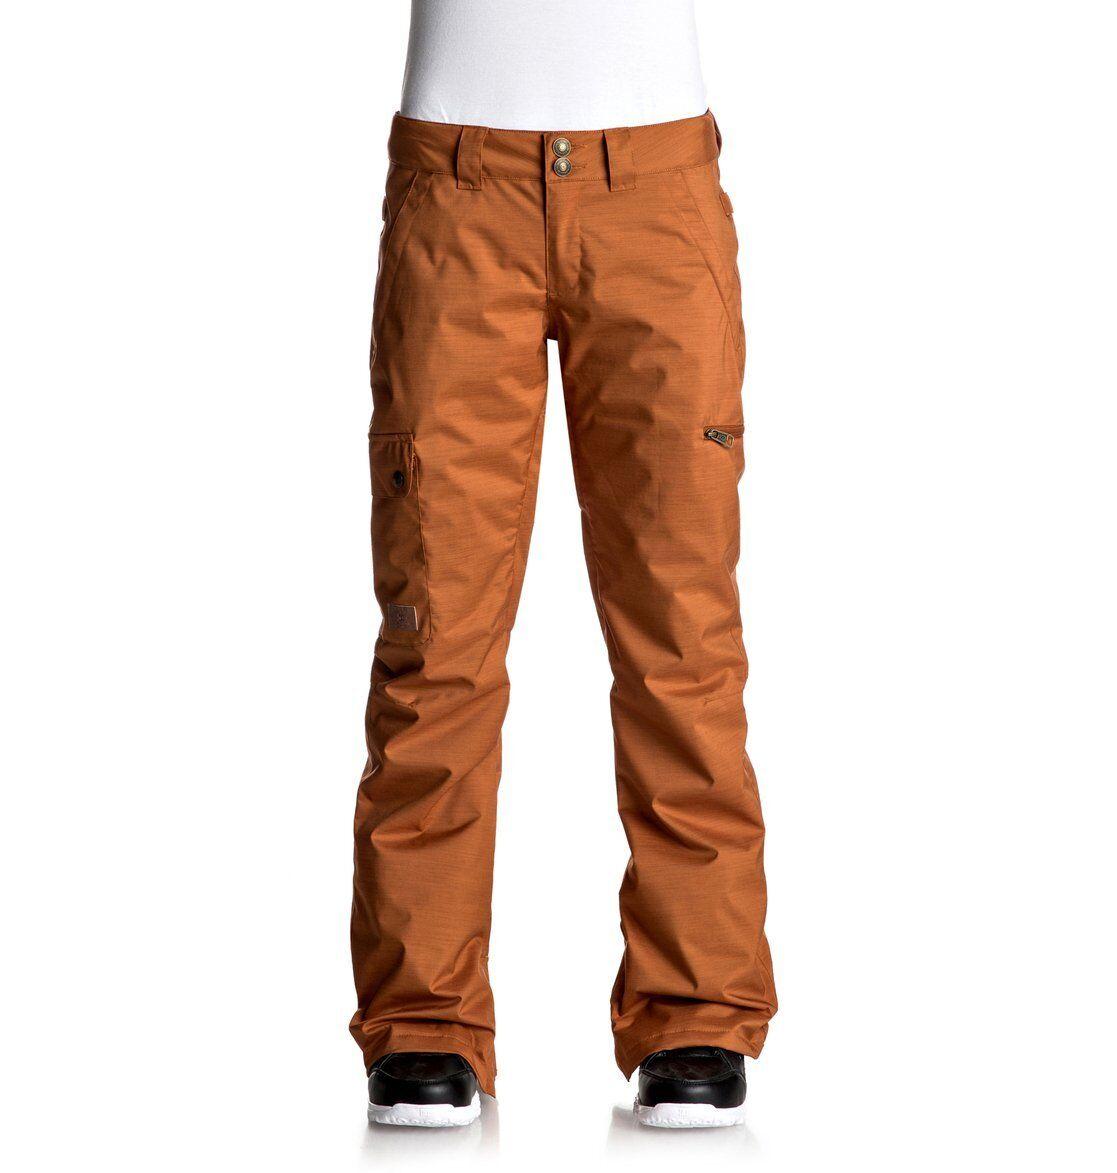 DC  Women's RECRUIT Snow Pants - CPL0 - Medium - NWT  factory outlets